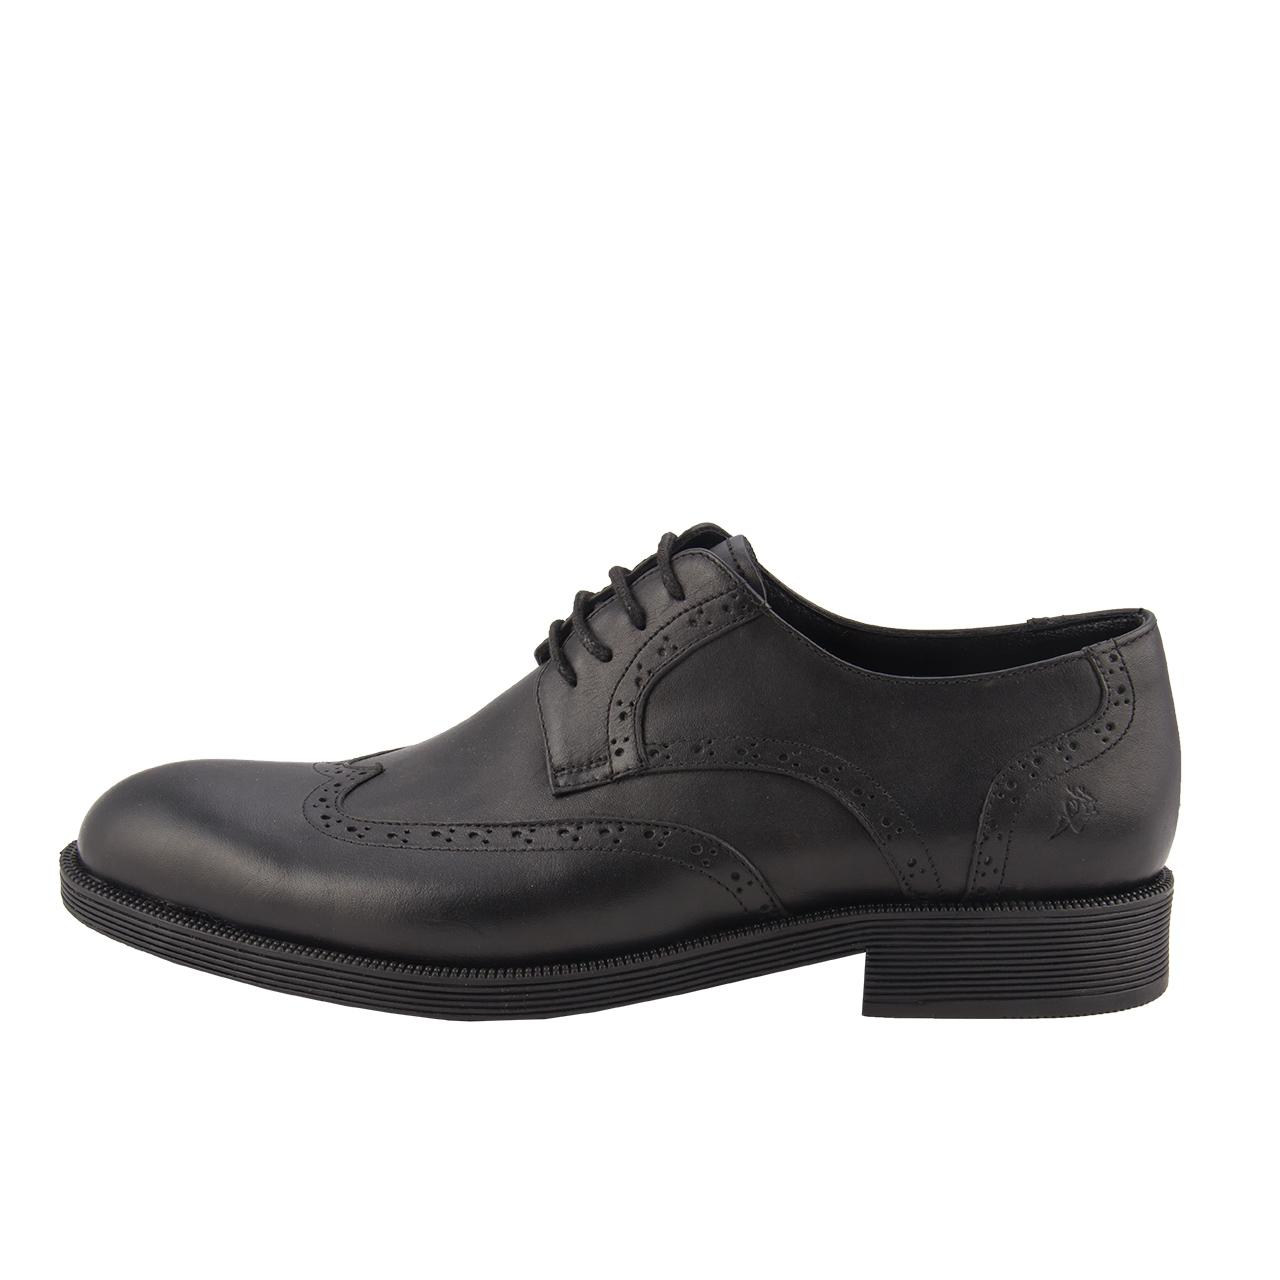 قیمت کفش مردانه مارال چرم مدل ویستا